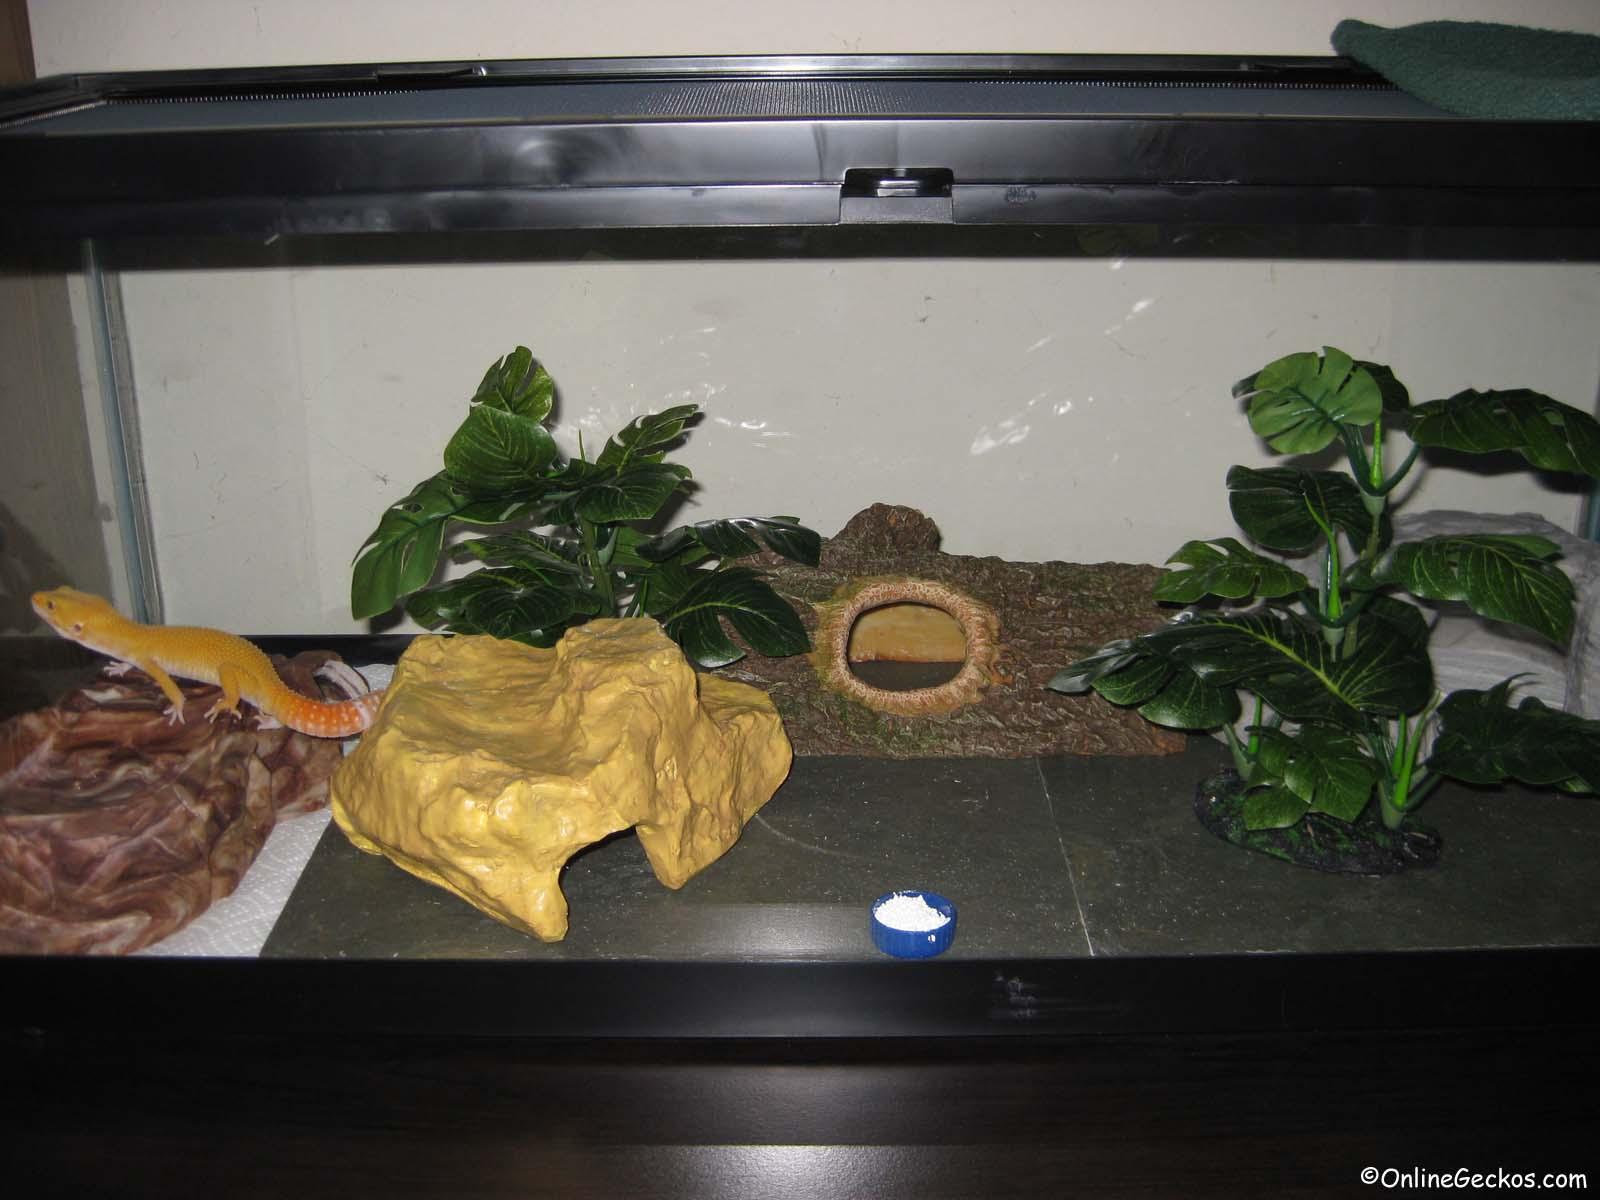 Basic Leopard Gecko Tank Setup Leopard Geckos For Sale Leopard